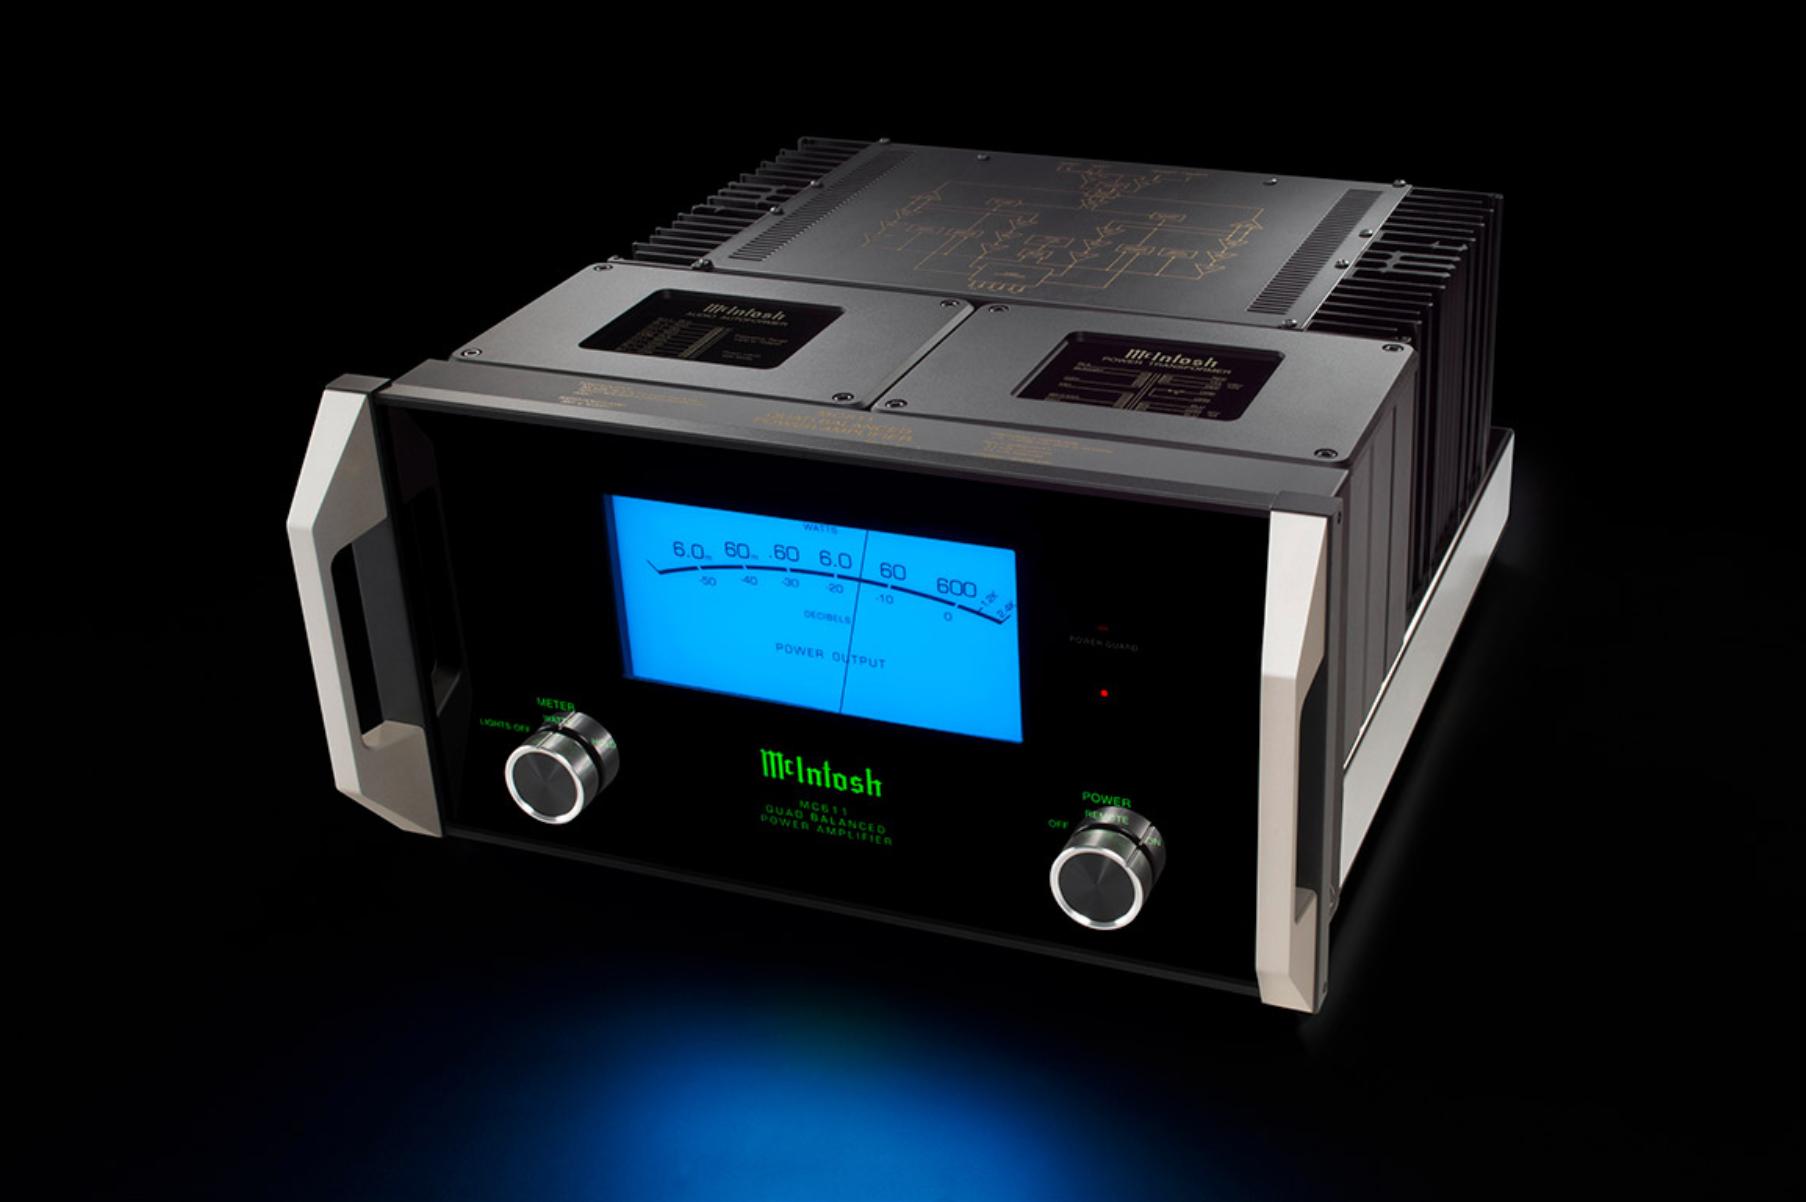 Mcintosh Mp1100 Vacuum Tube Phono Preamplifier Modular Mc611 Power Amplifier